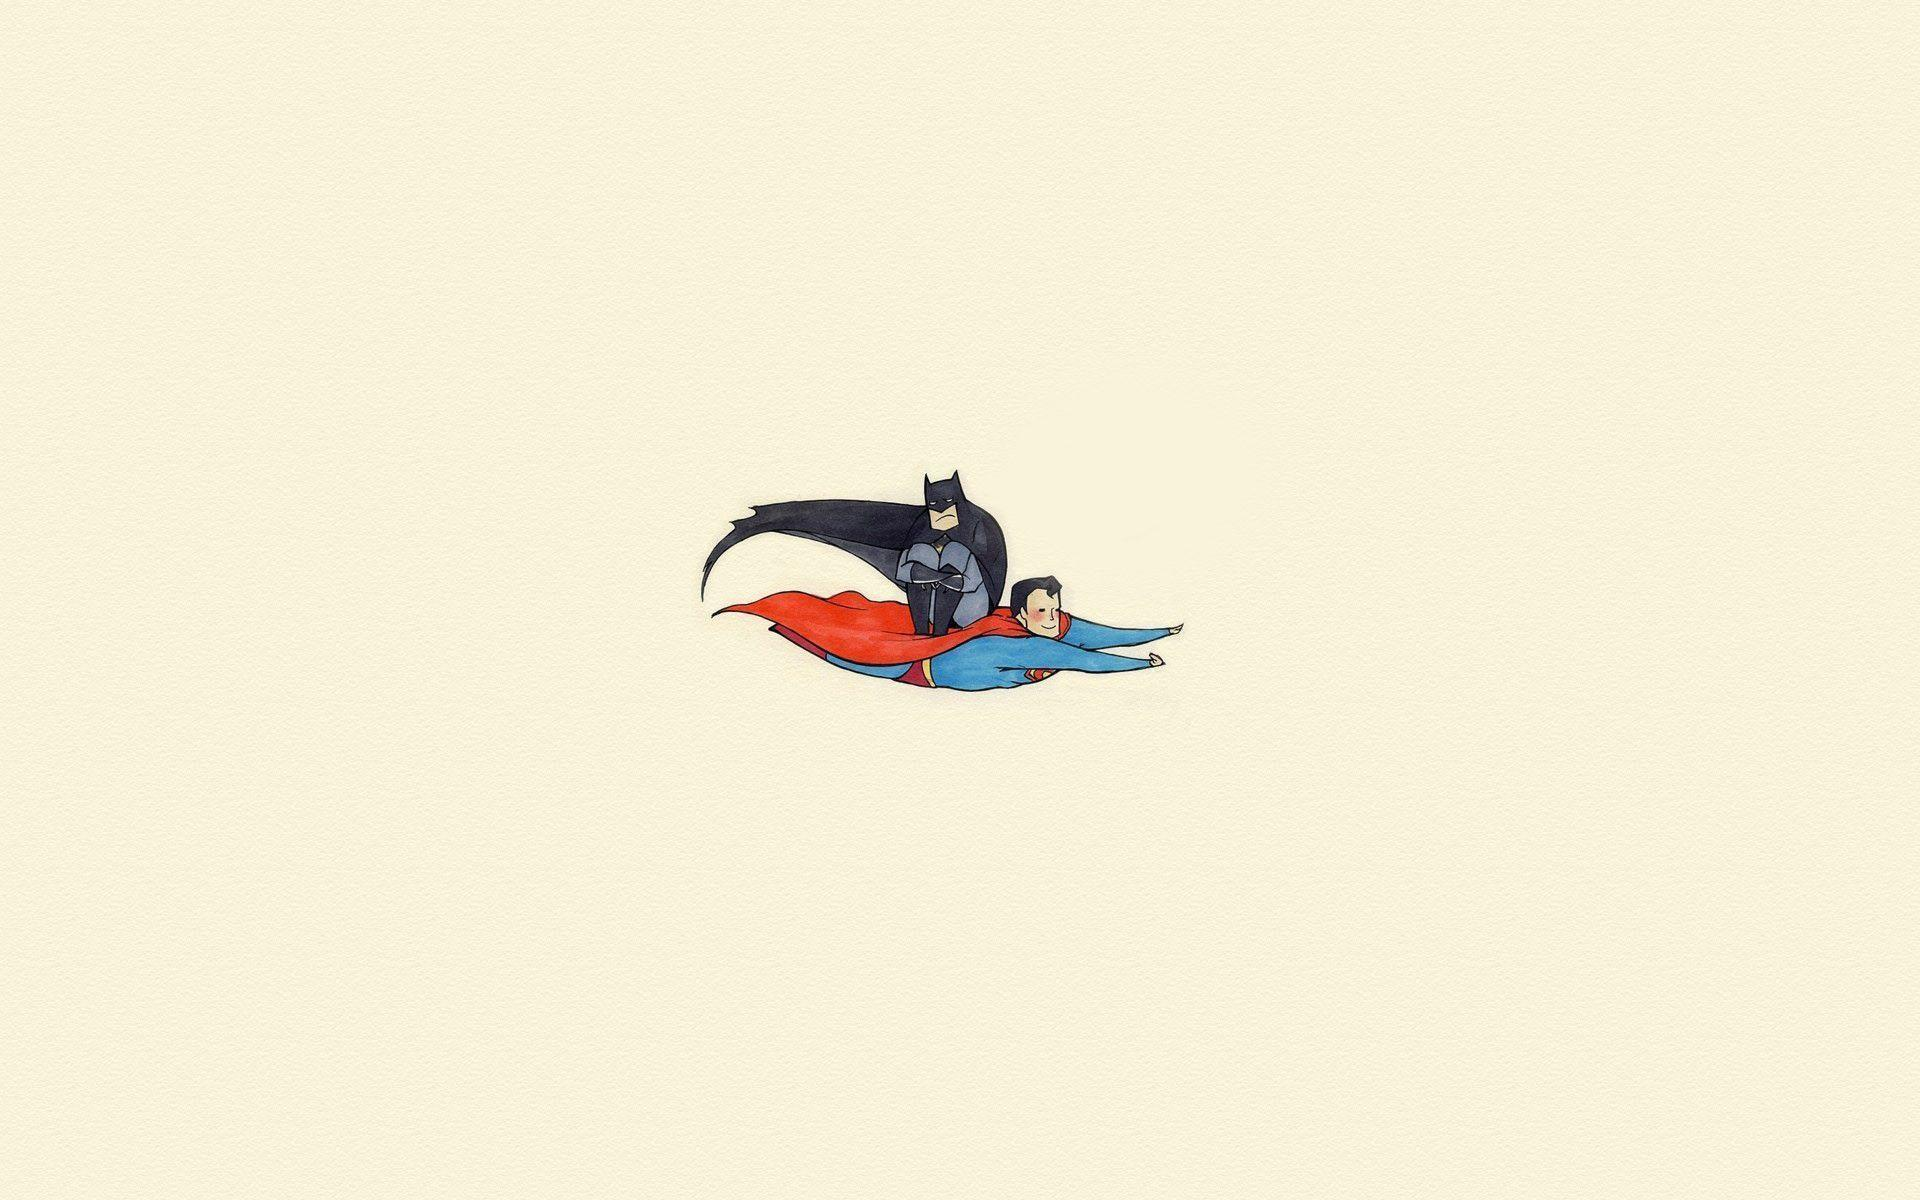 batman and superman cartoon wallpaper - photo #40